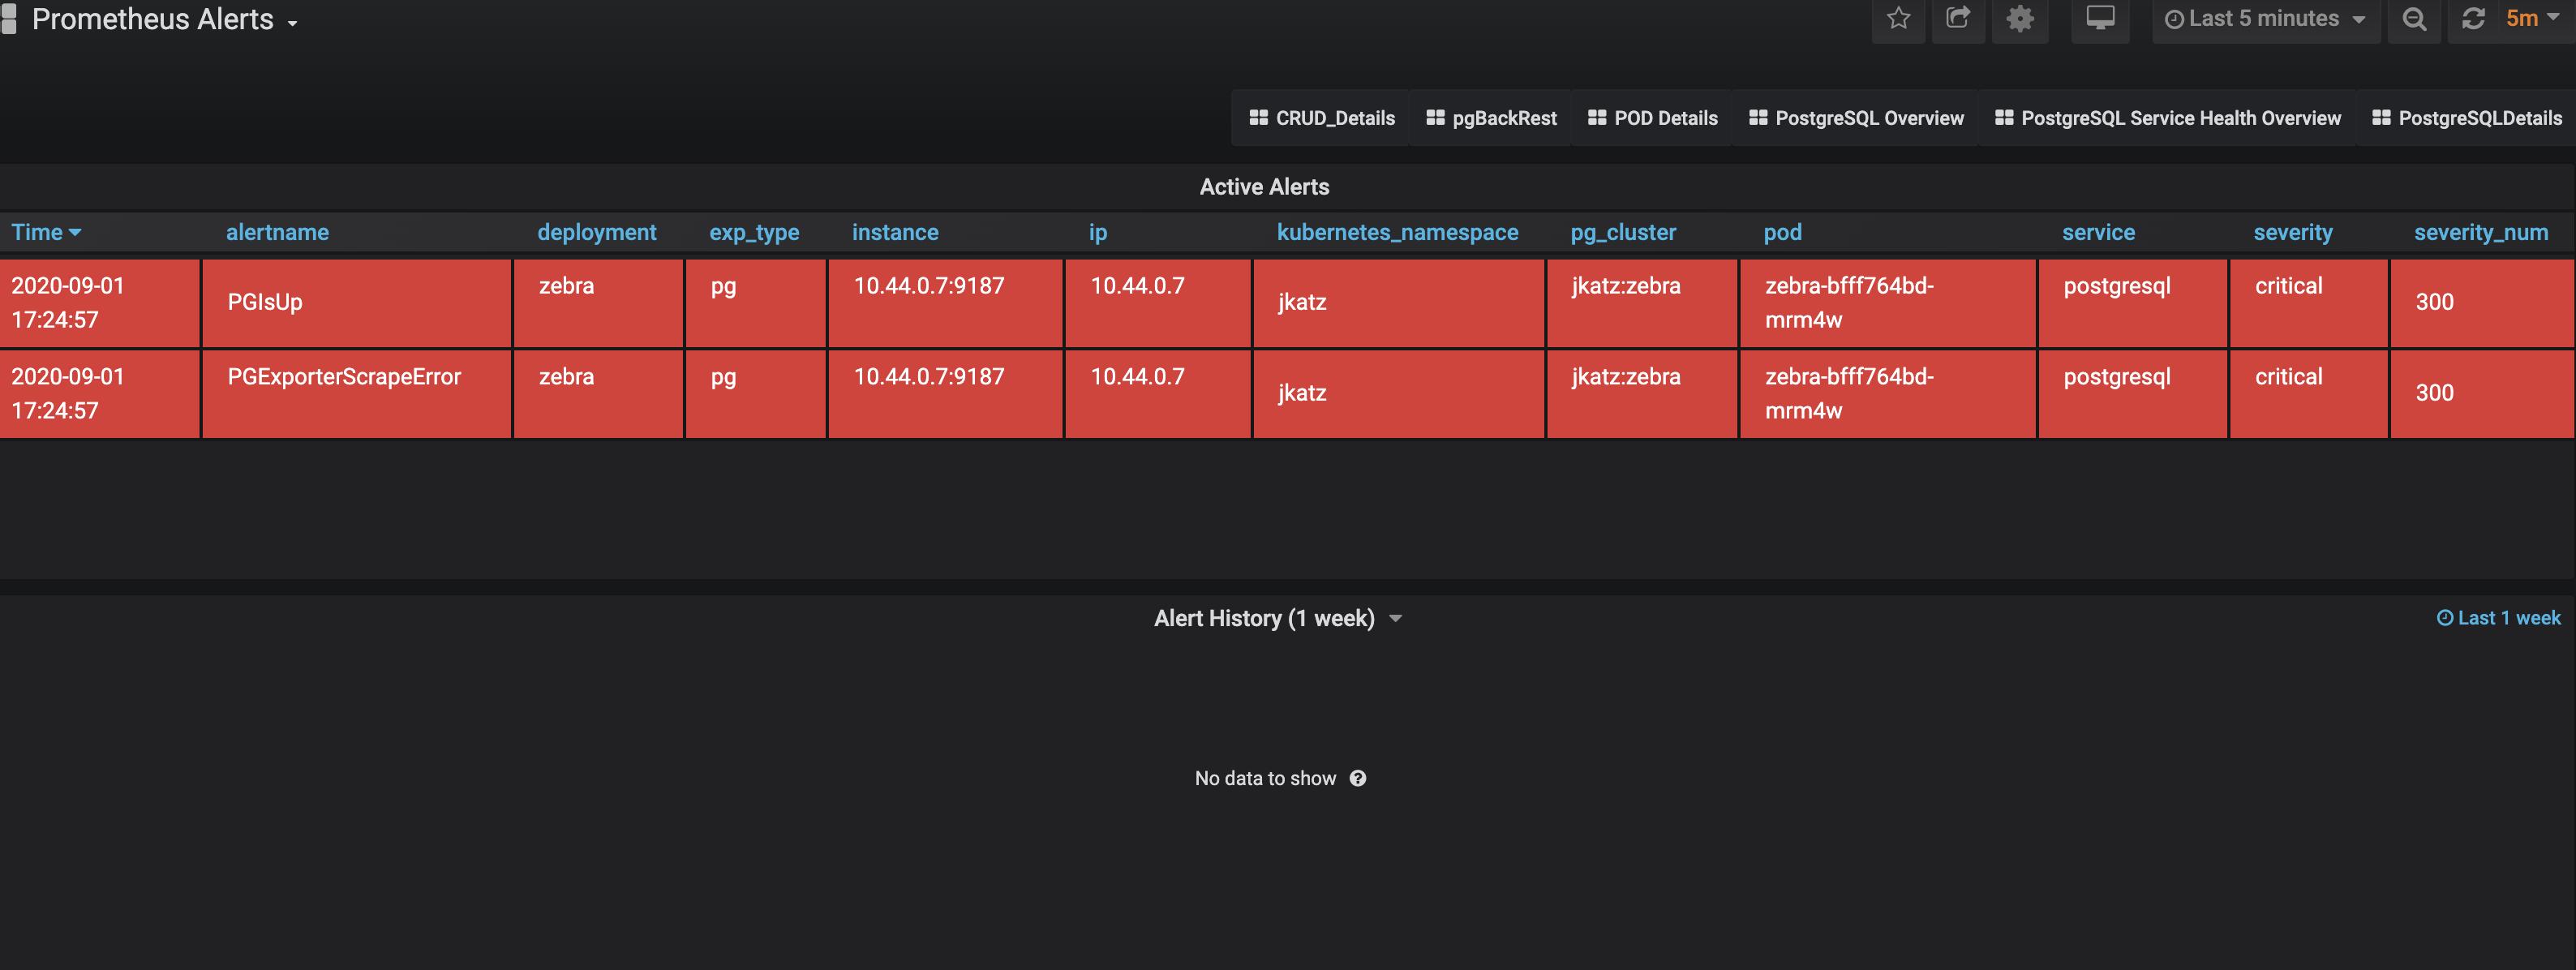 PostgreSQL Operator Monitoring - Alerts